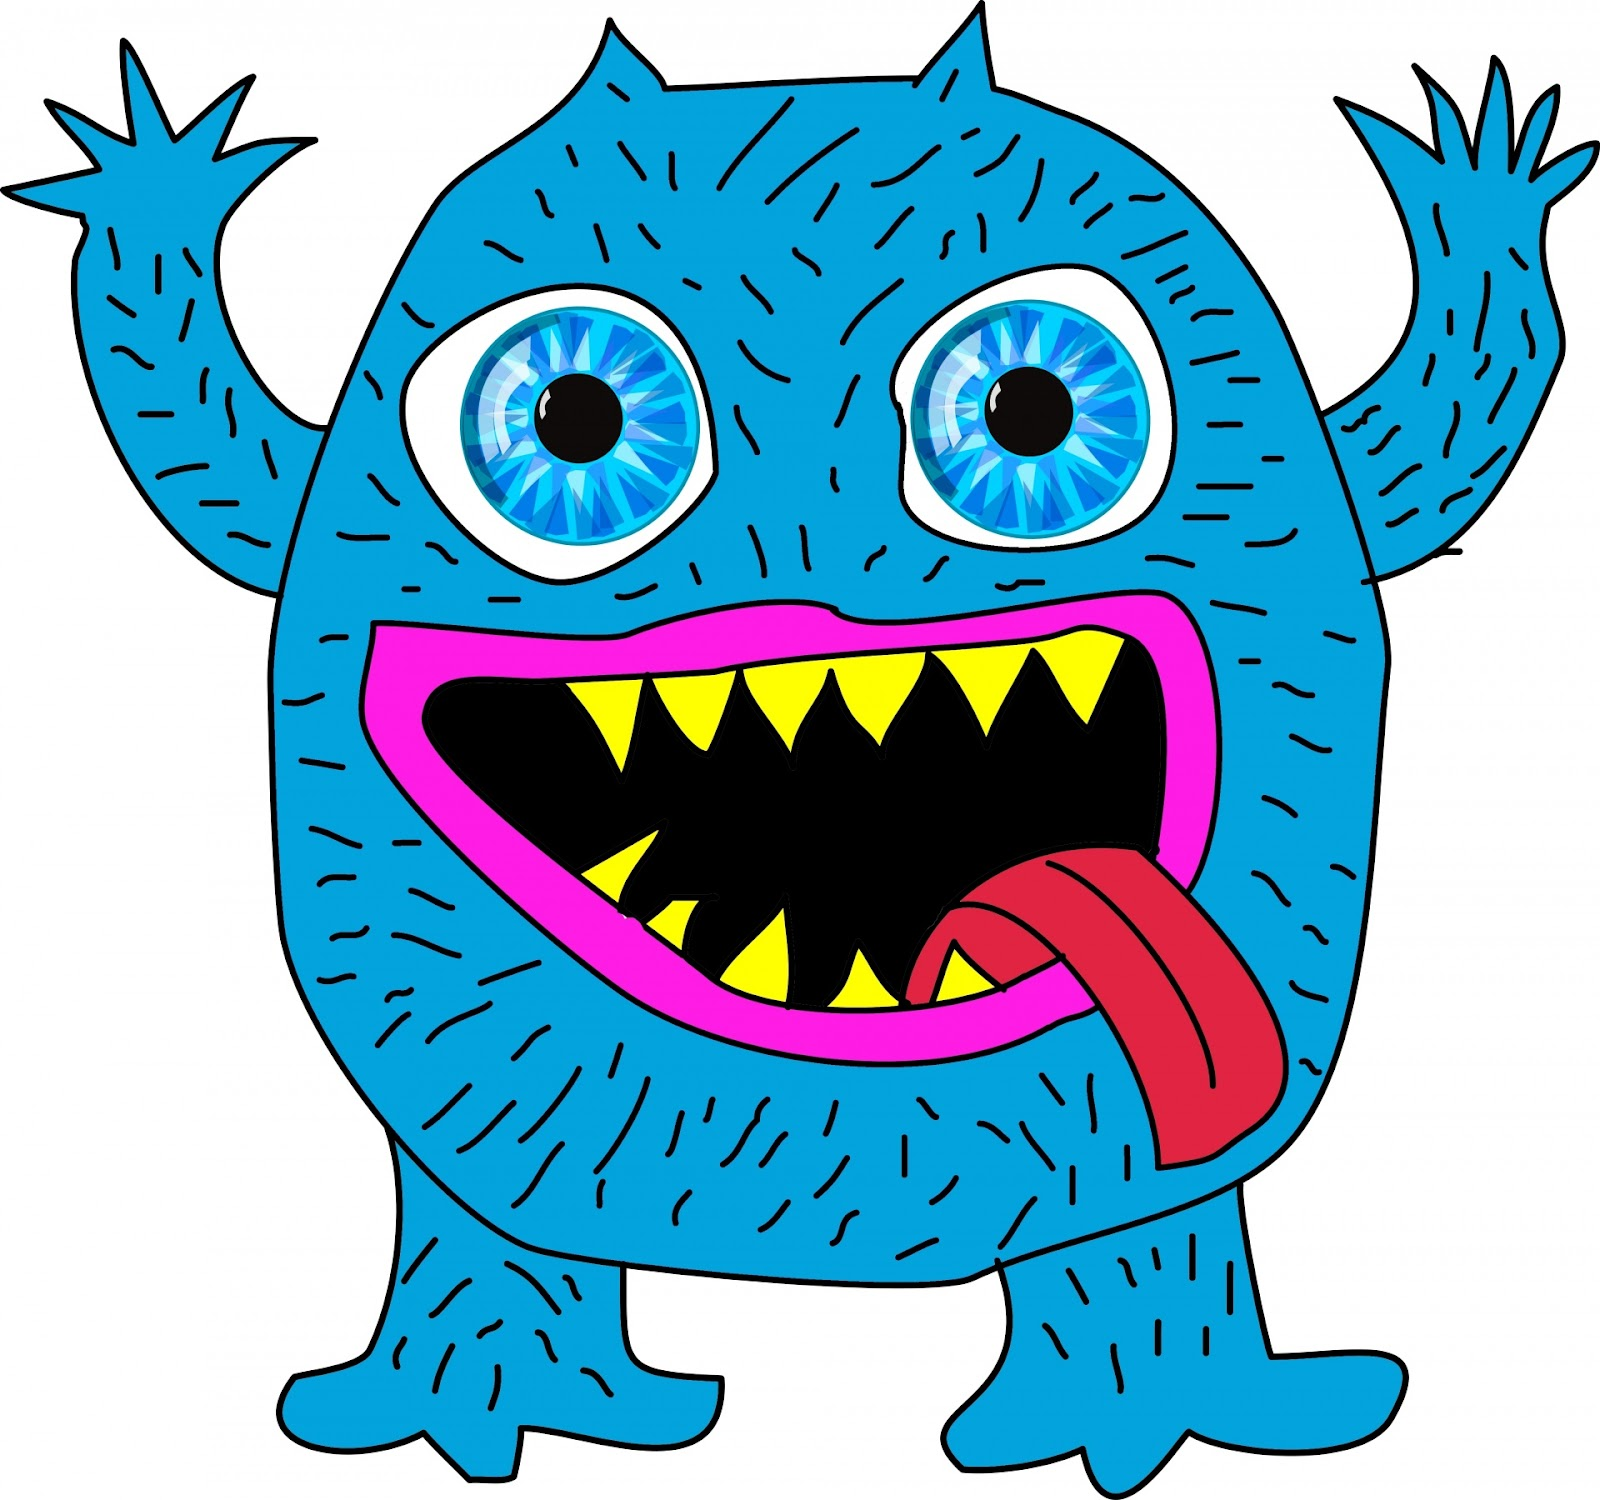 http://www.publicdomainpictures.net/pictures/160000/velka/blue-monster.jpg